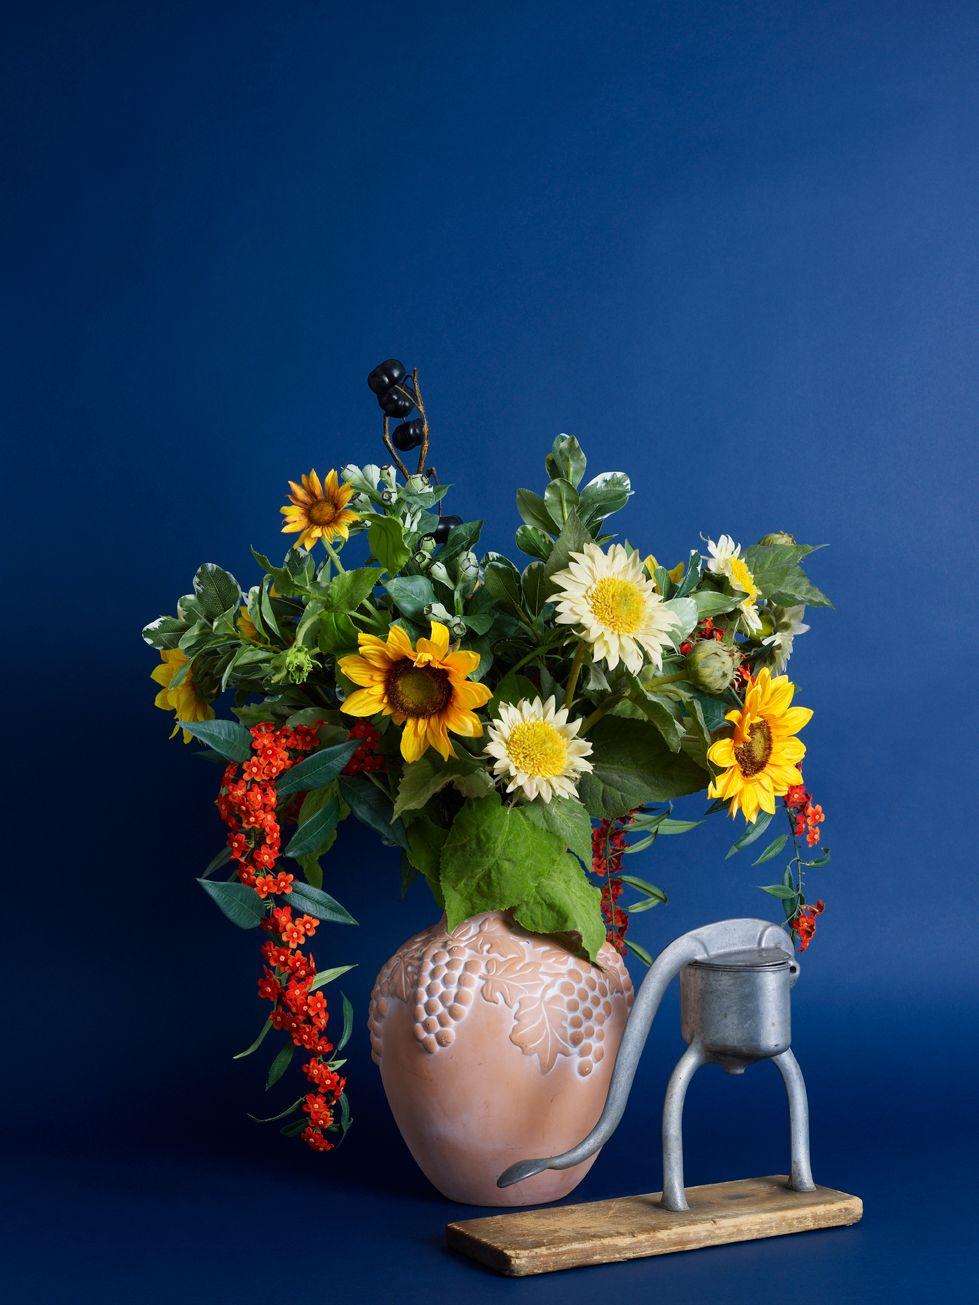 Sunflowers for a country kitchen silk flower designs pinterest